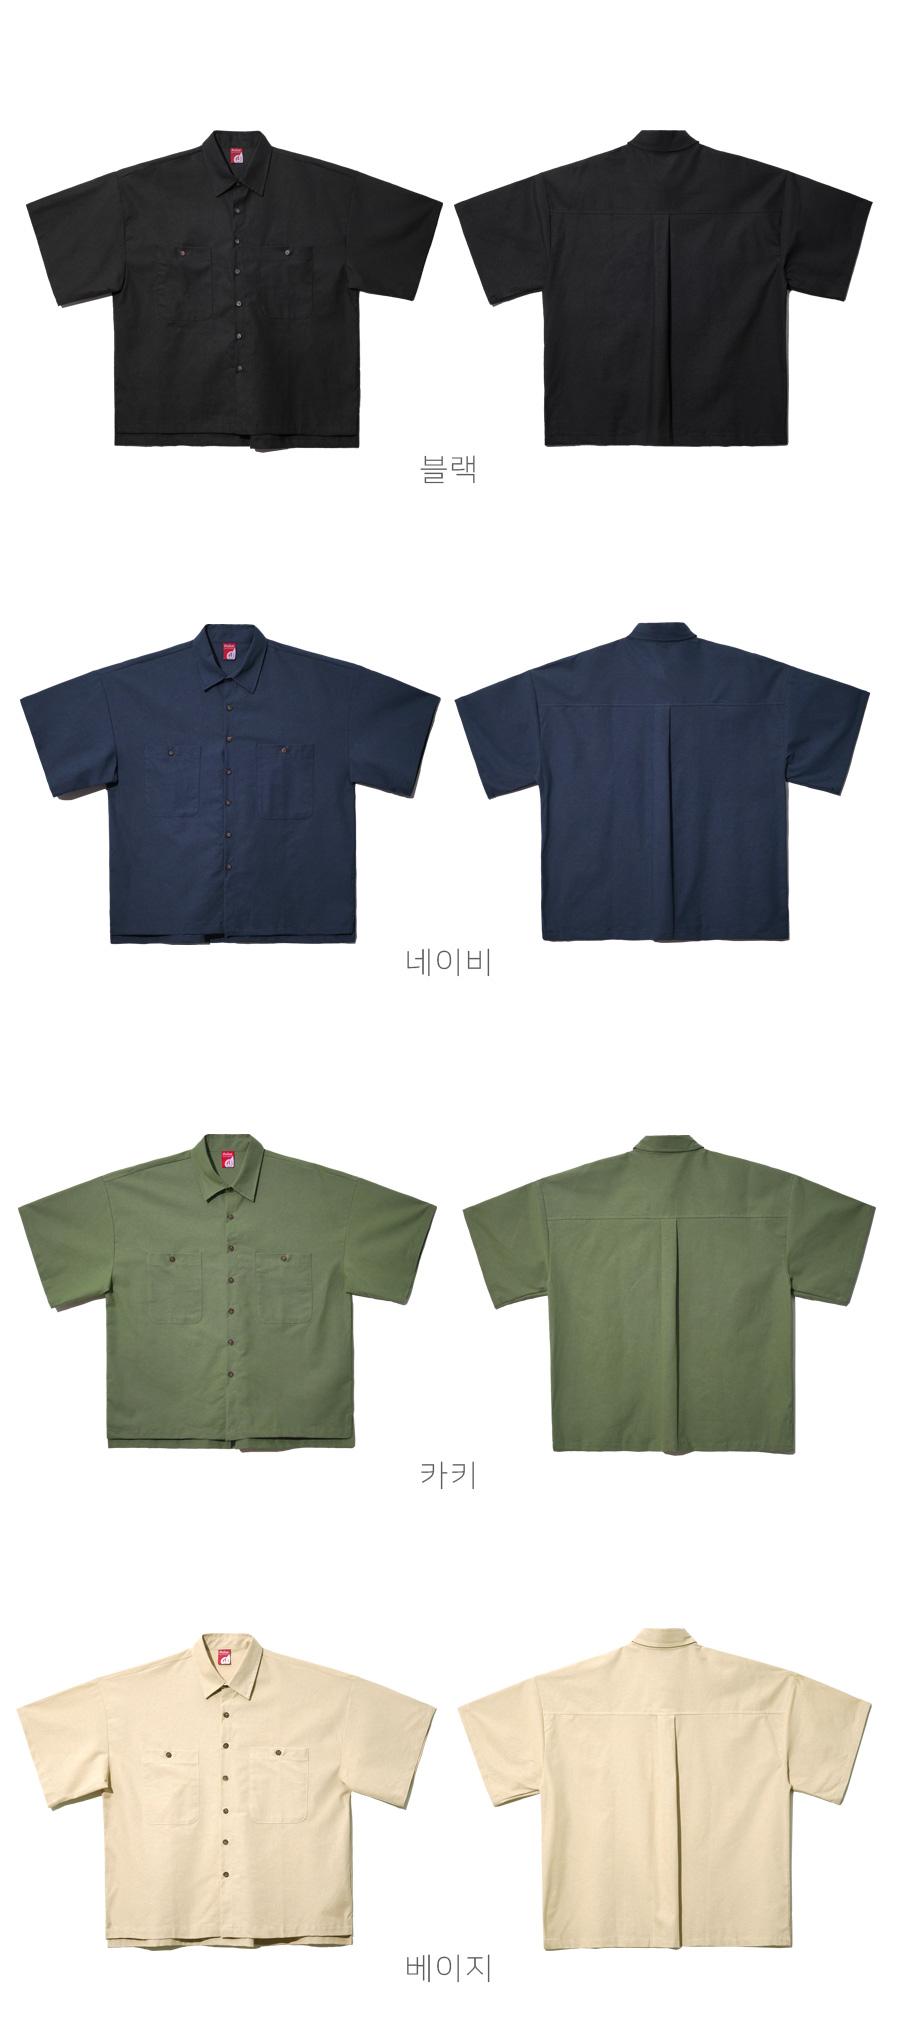 20200522_dy_dayin_shirts_detail_sh_01.jpg